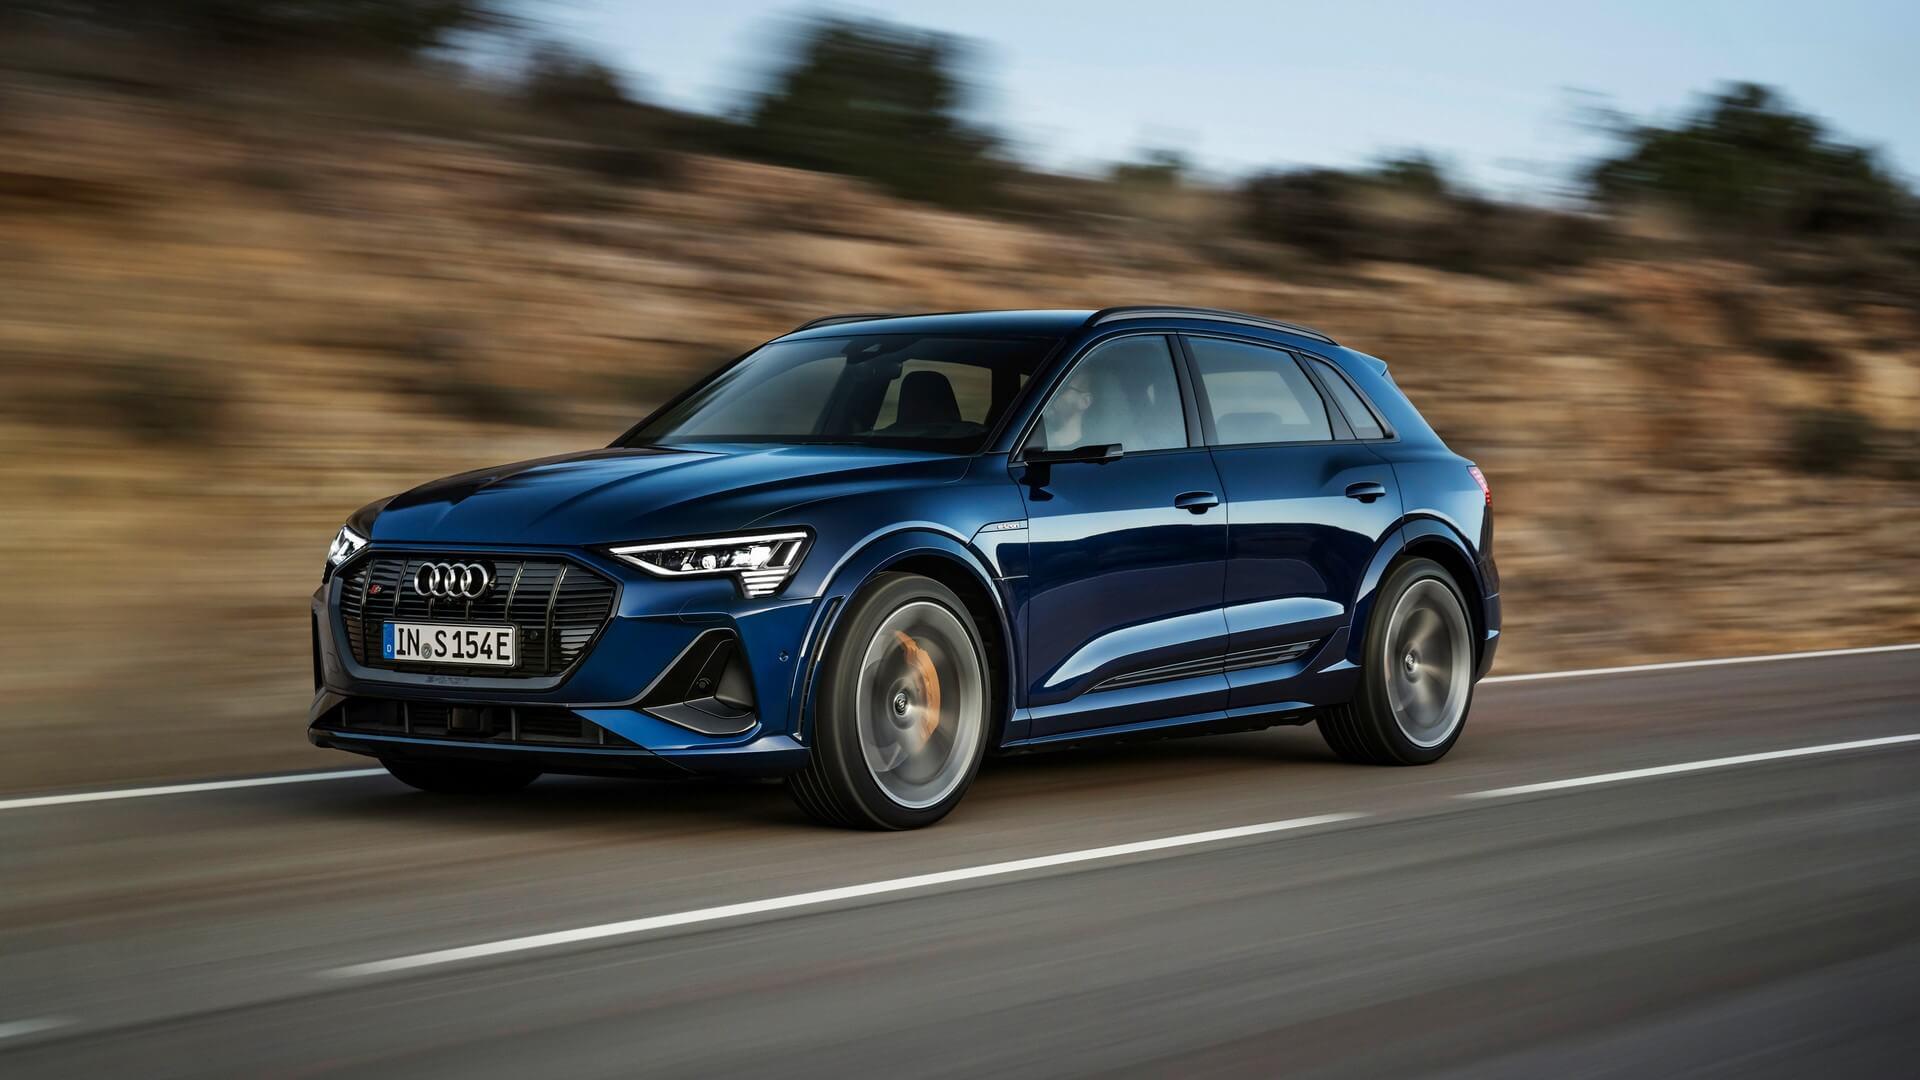 Audi-E-Tron-S-and-E-Tron-S-Sportback-2020-18